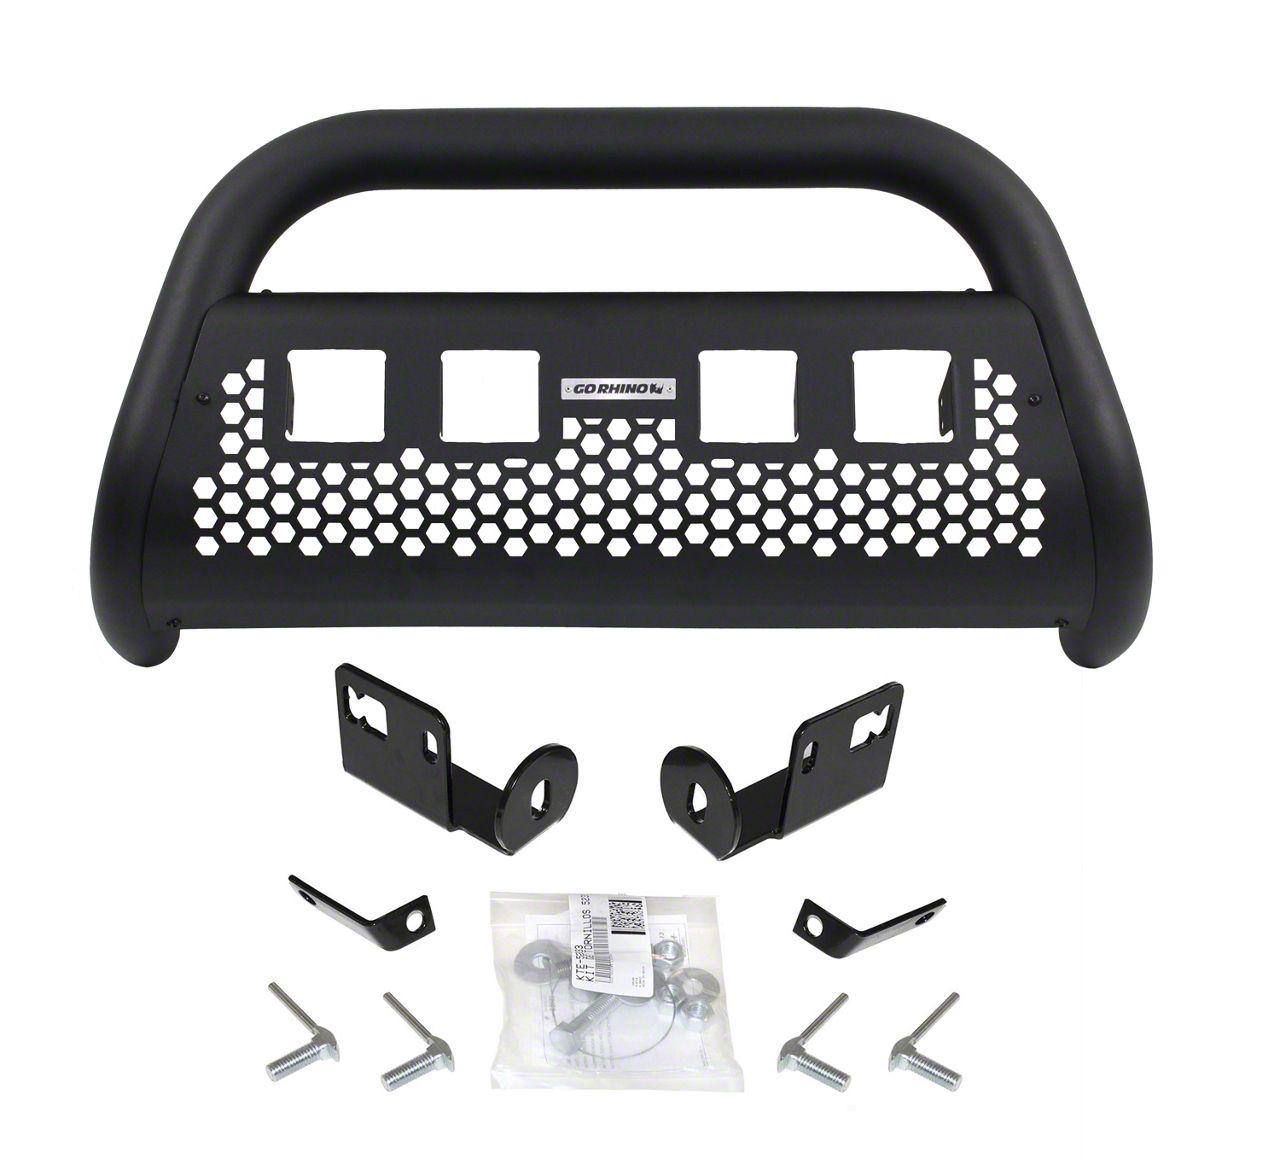 Go Rhino RC2 LR Bull Bar w/ Four LED Cube Light Mounting Brackets - Textured Black (05-15 Tacoma, Excluding TRD)